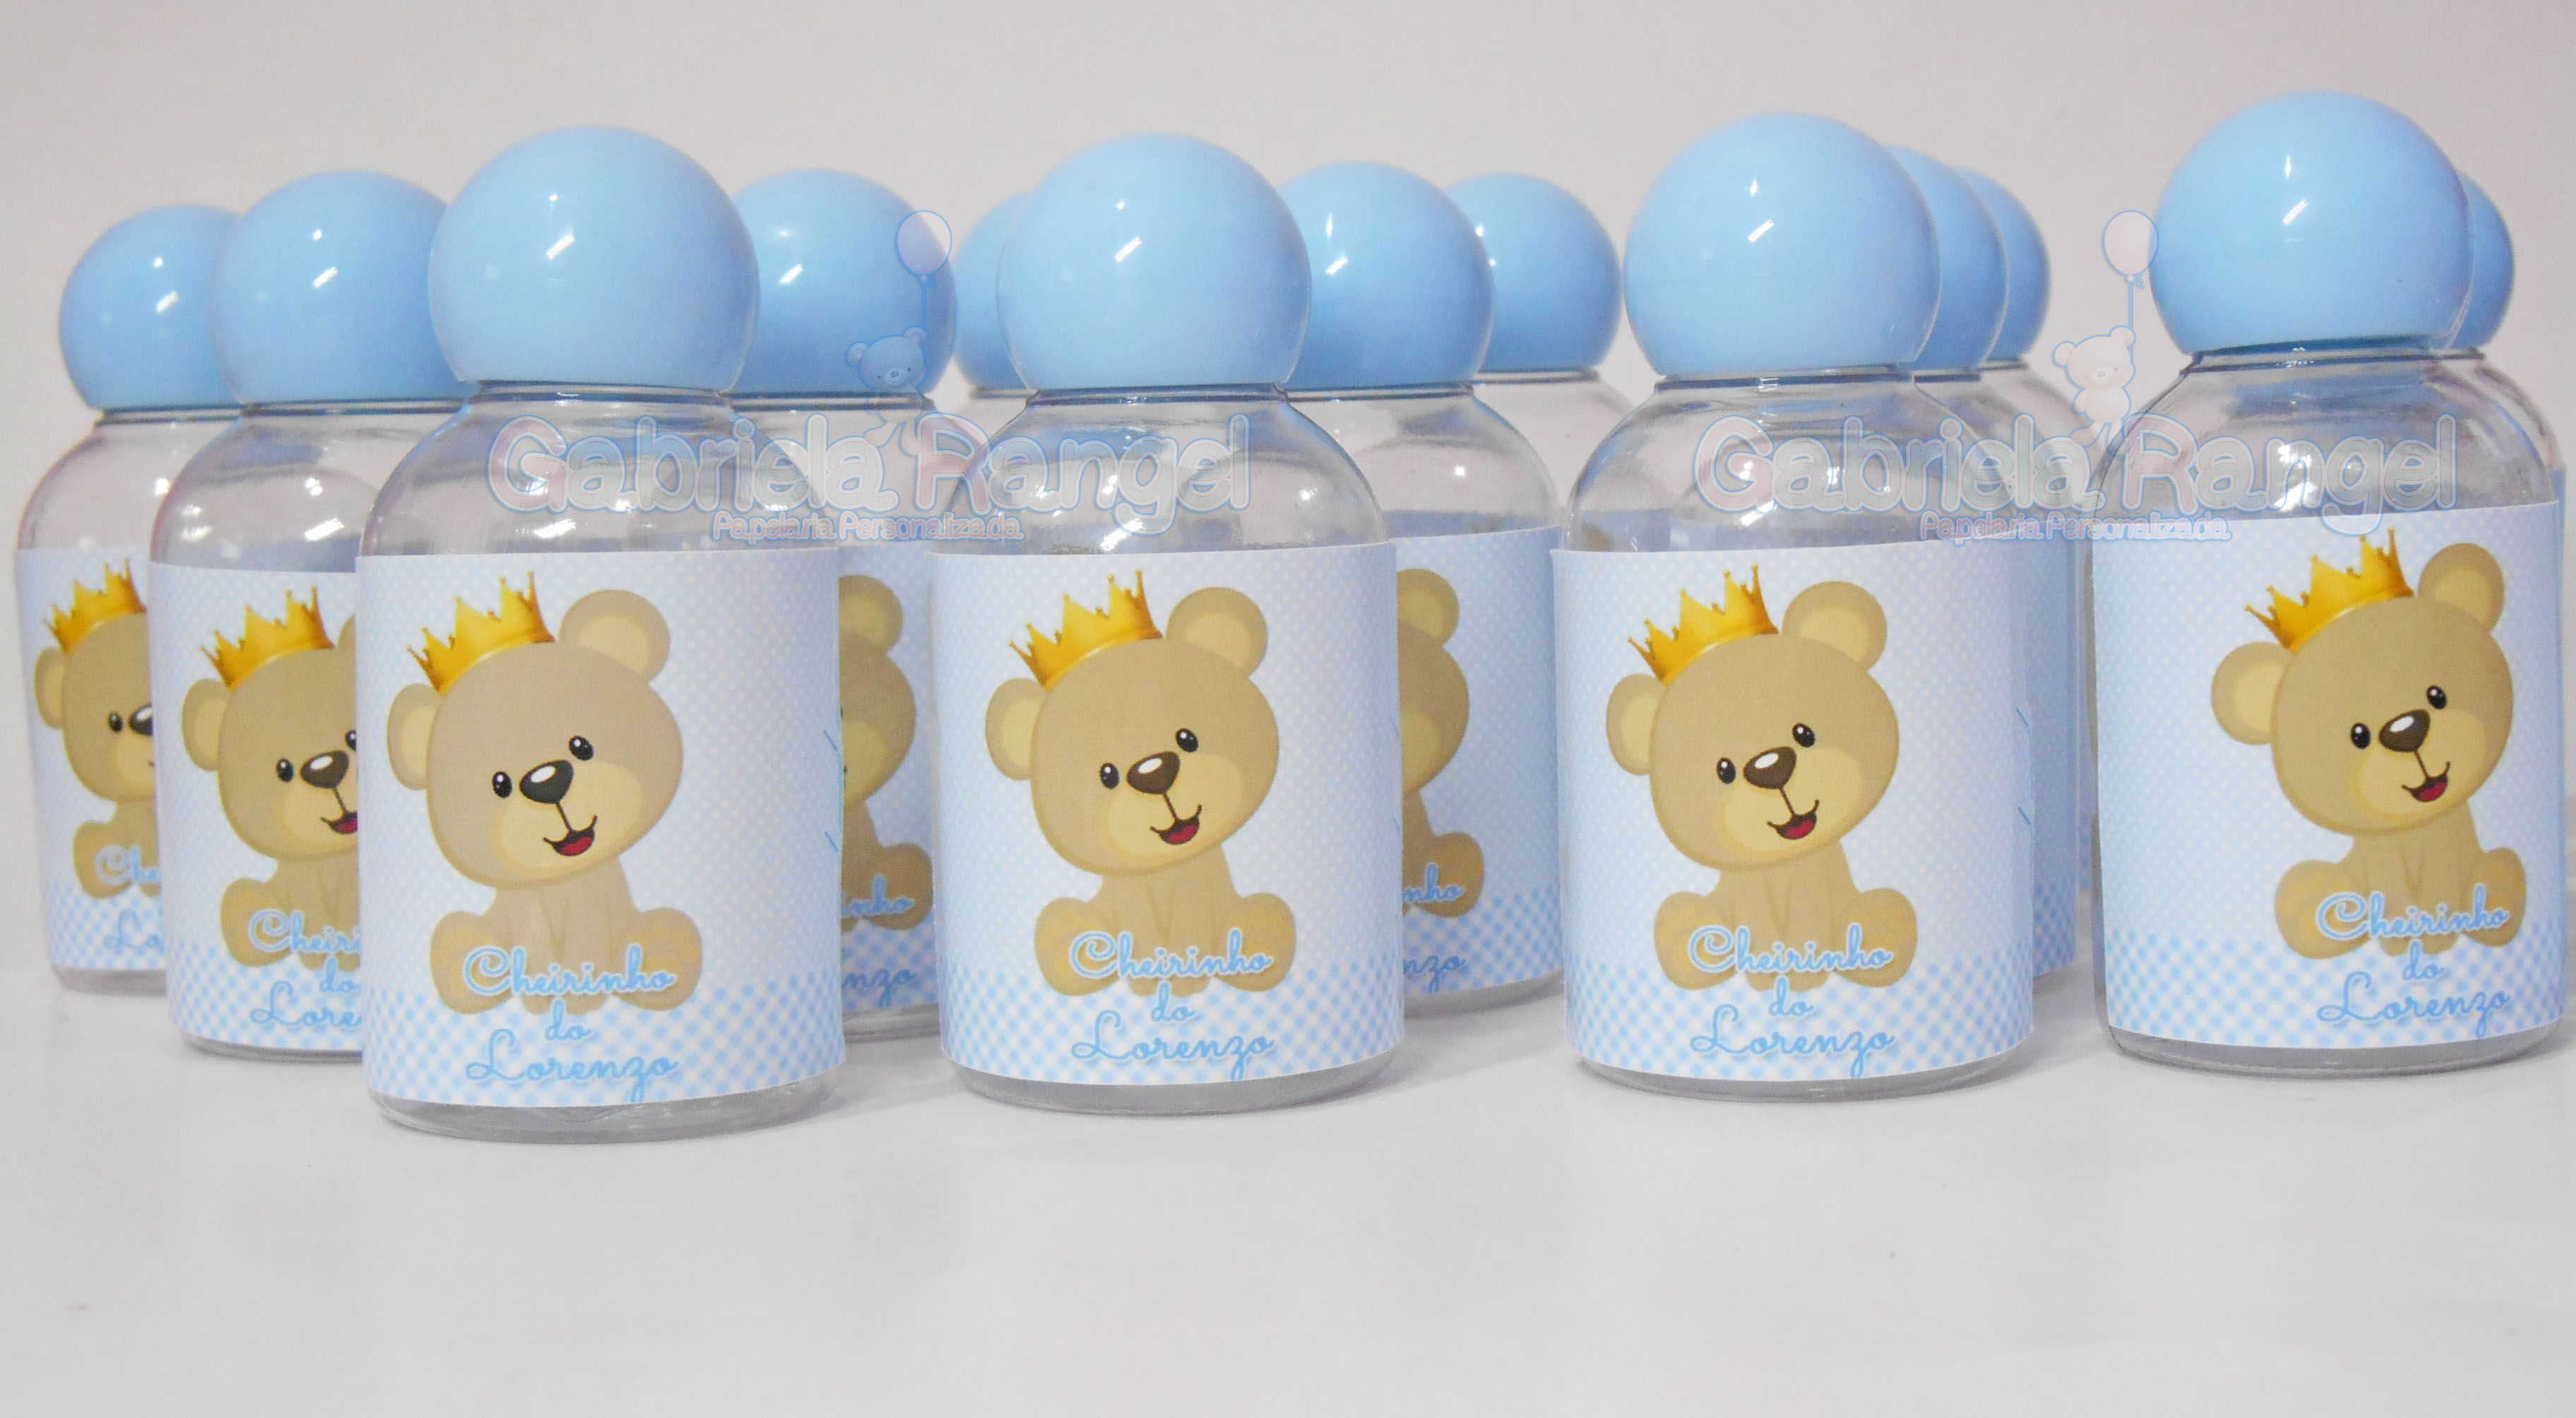 Garrafinha personalizada para festa infantil Garrafinha Personalizada para Shampoo